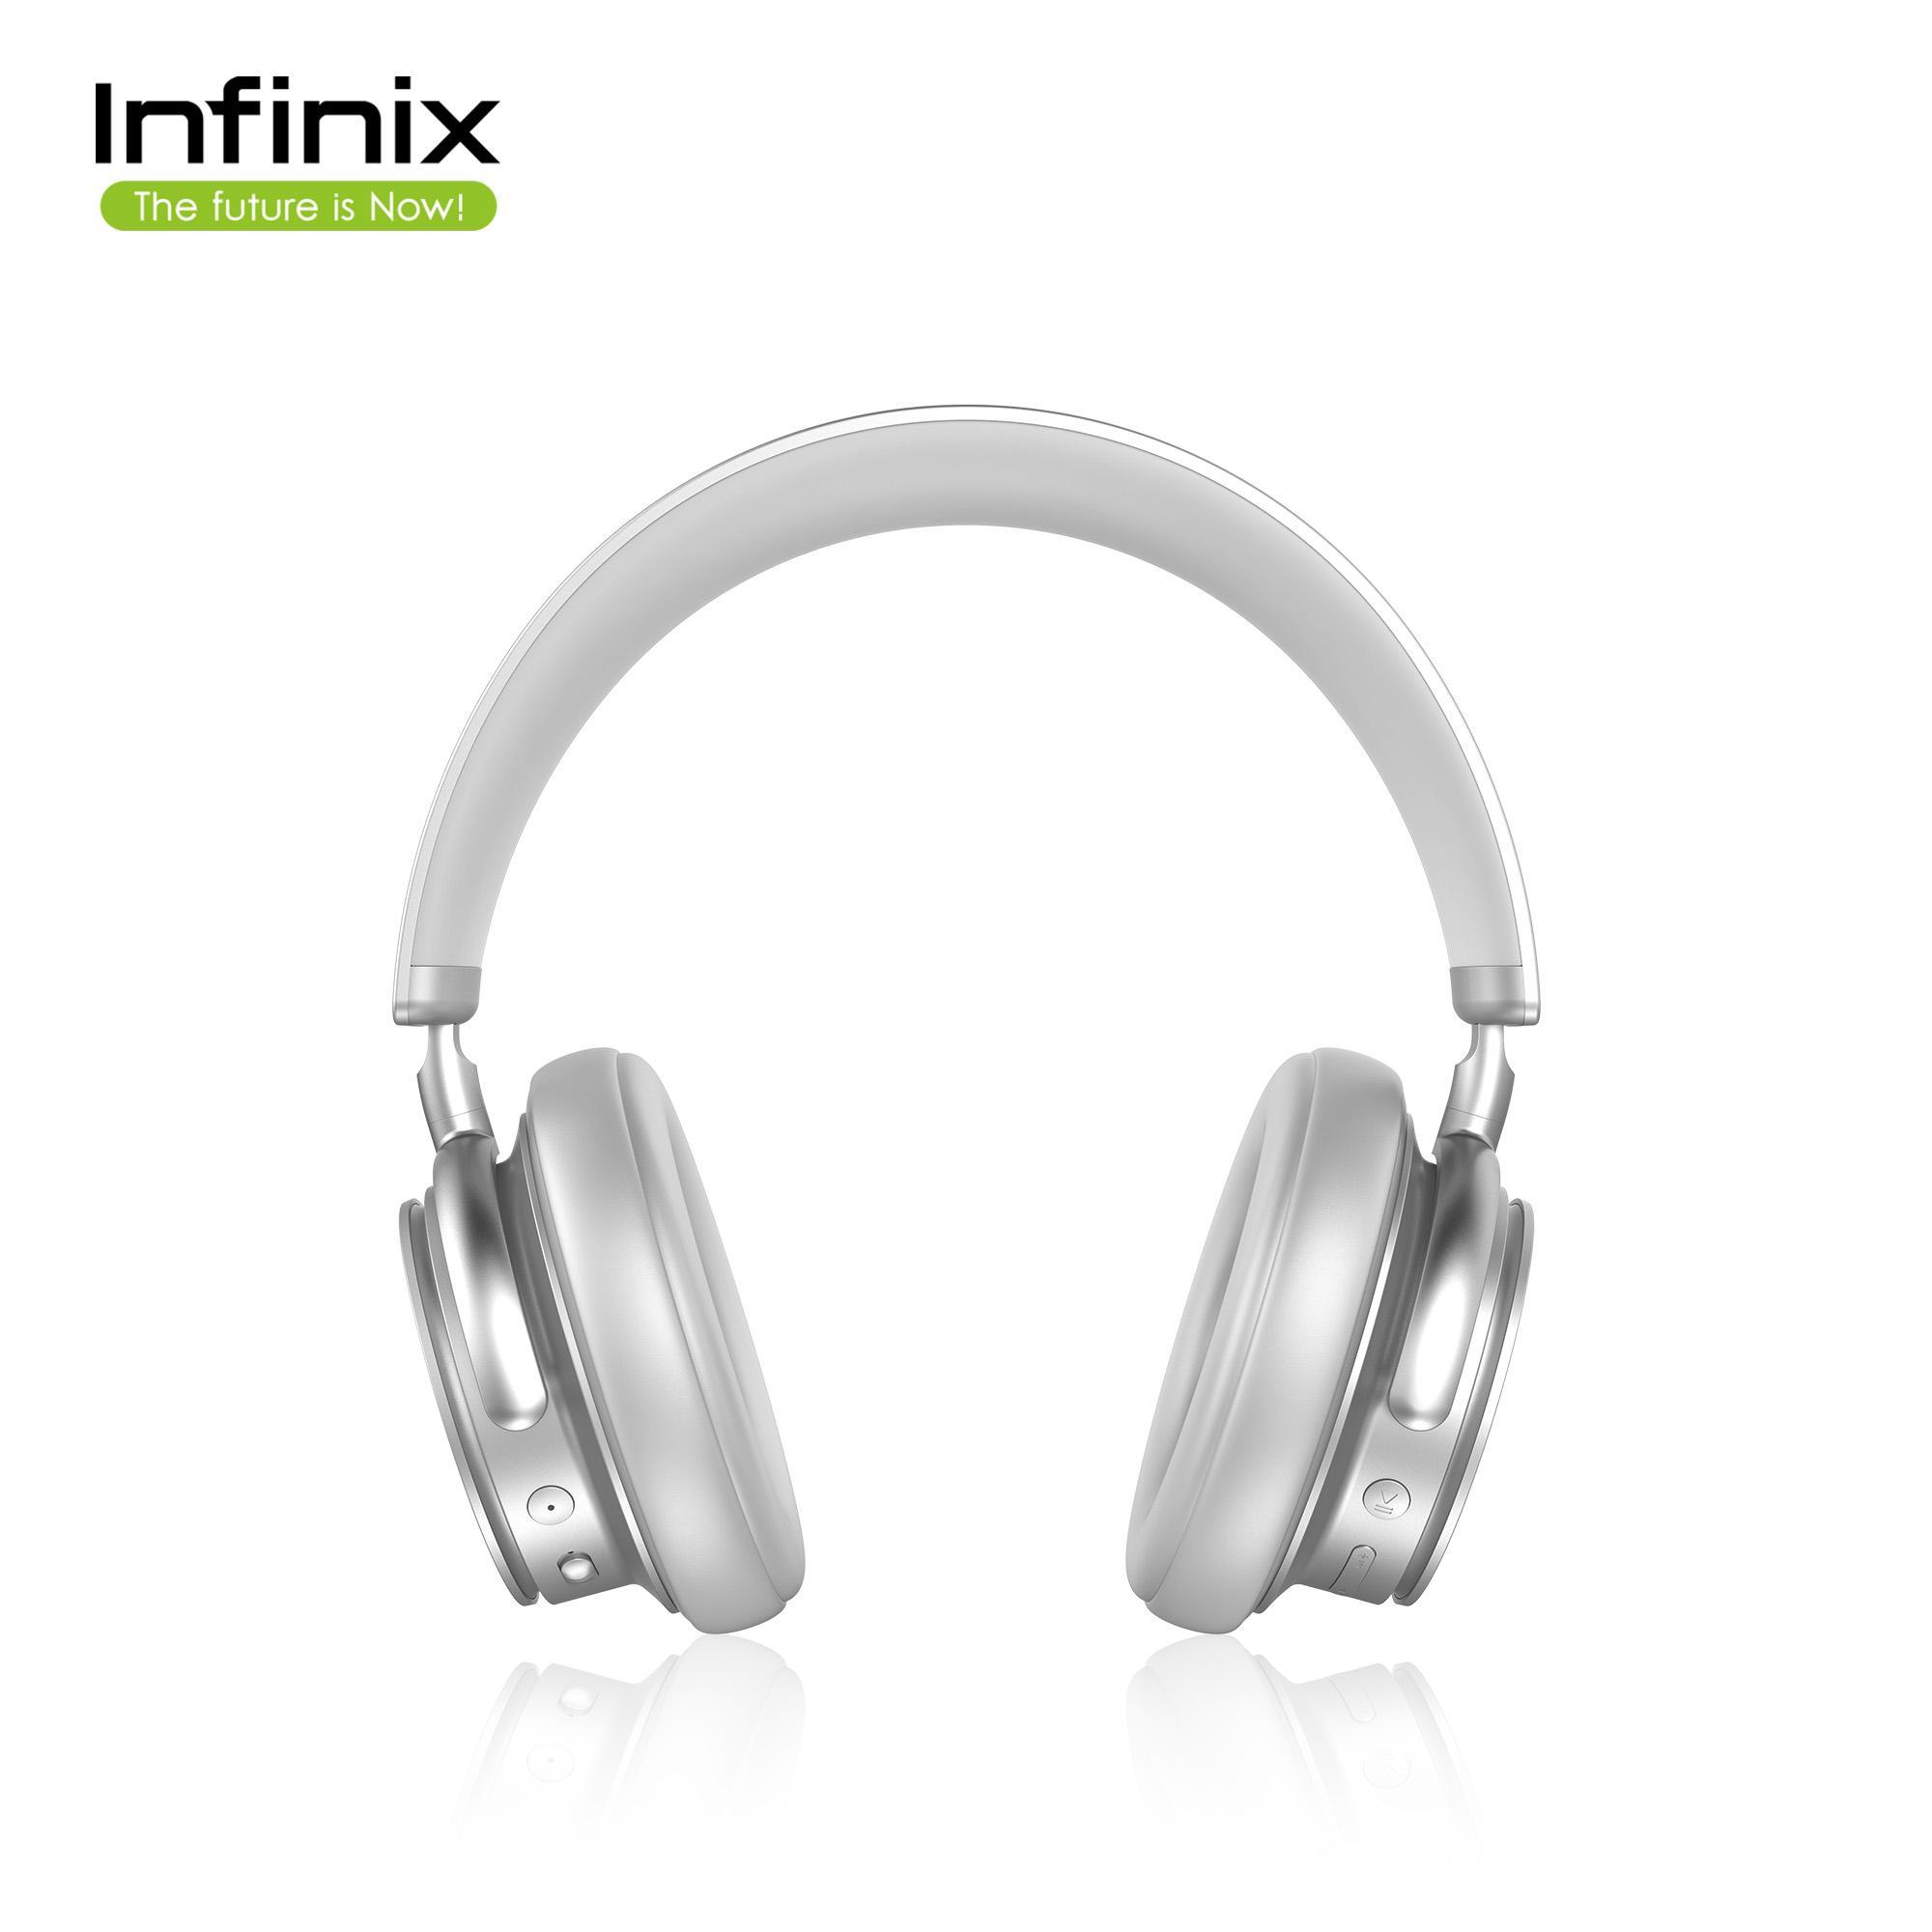 Headphones For Sale Bluetooth Prices Brands Specs In Headset Mini S 530 S530 Infinix Quiet X Headphone